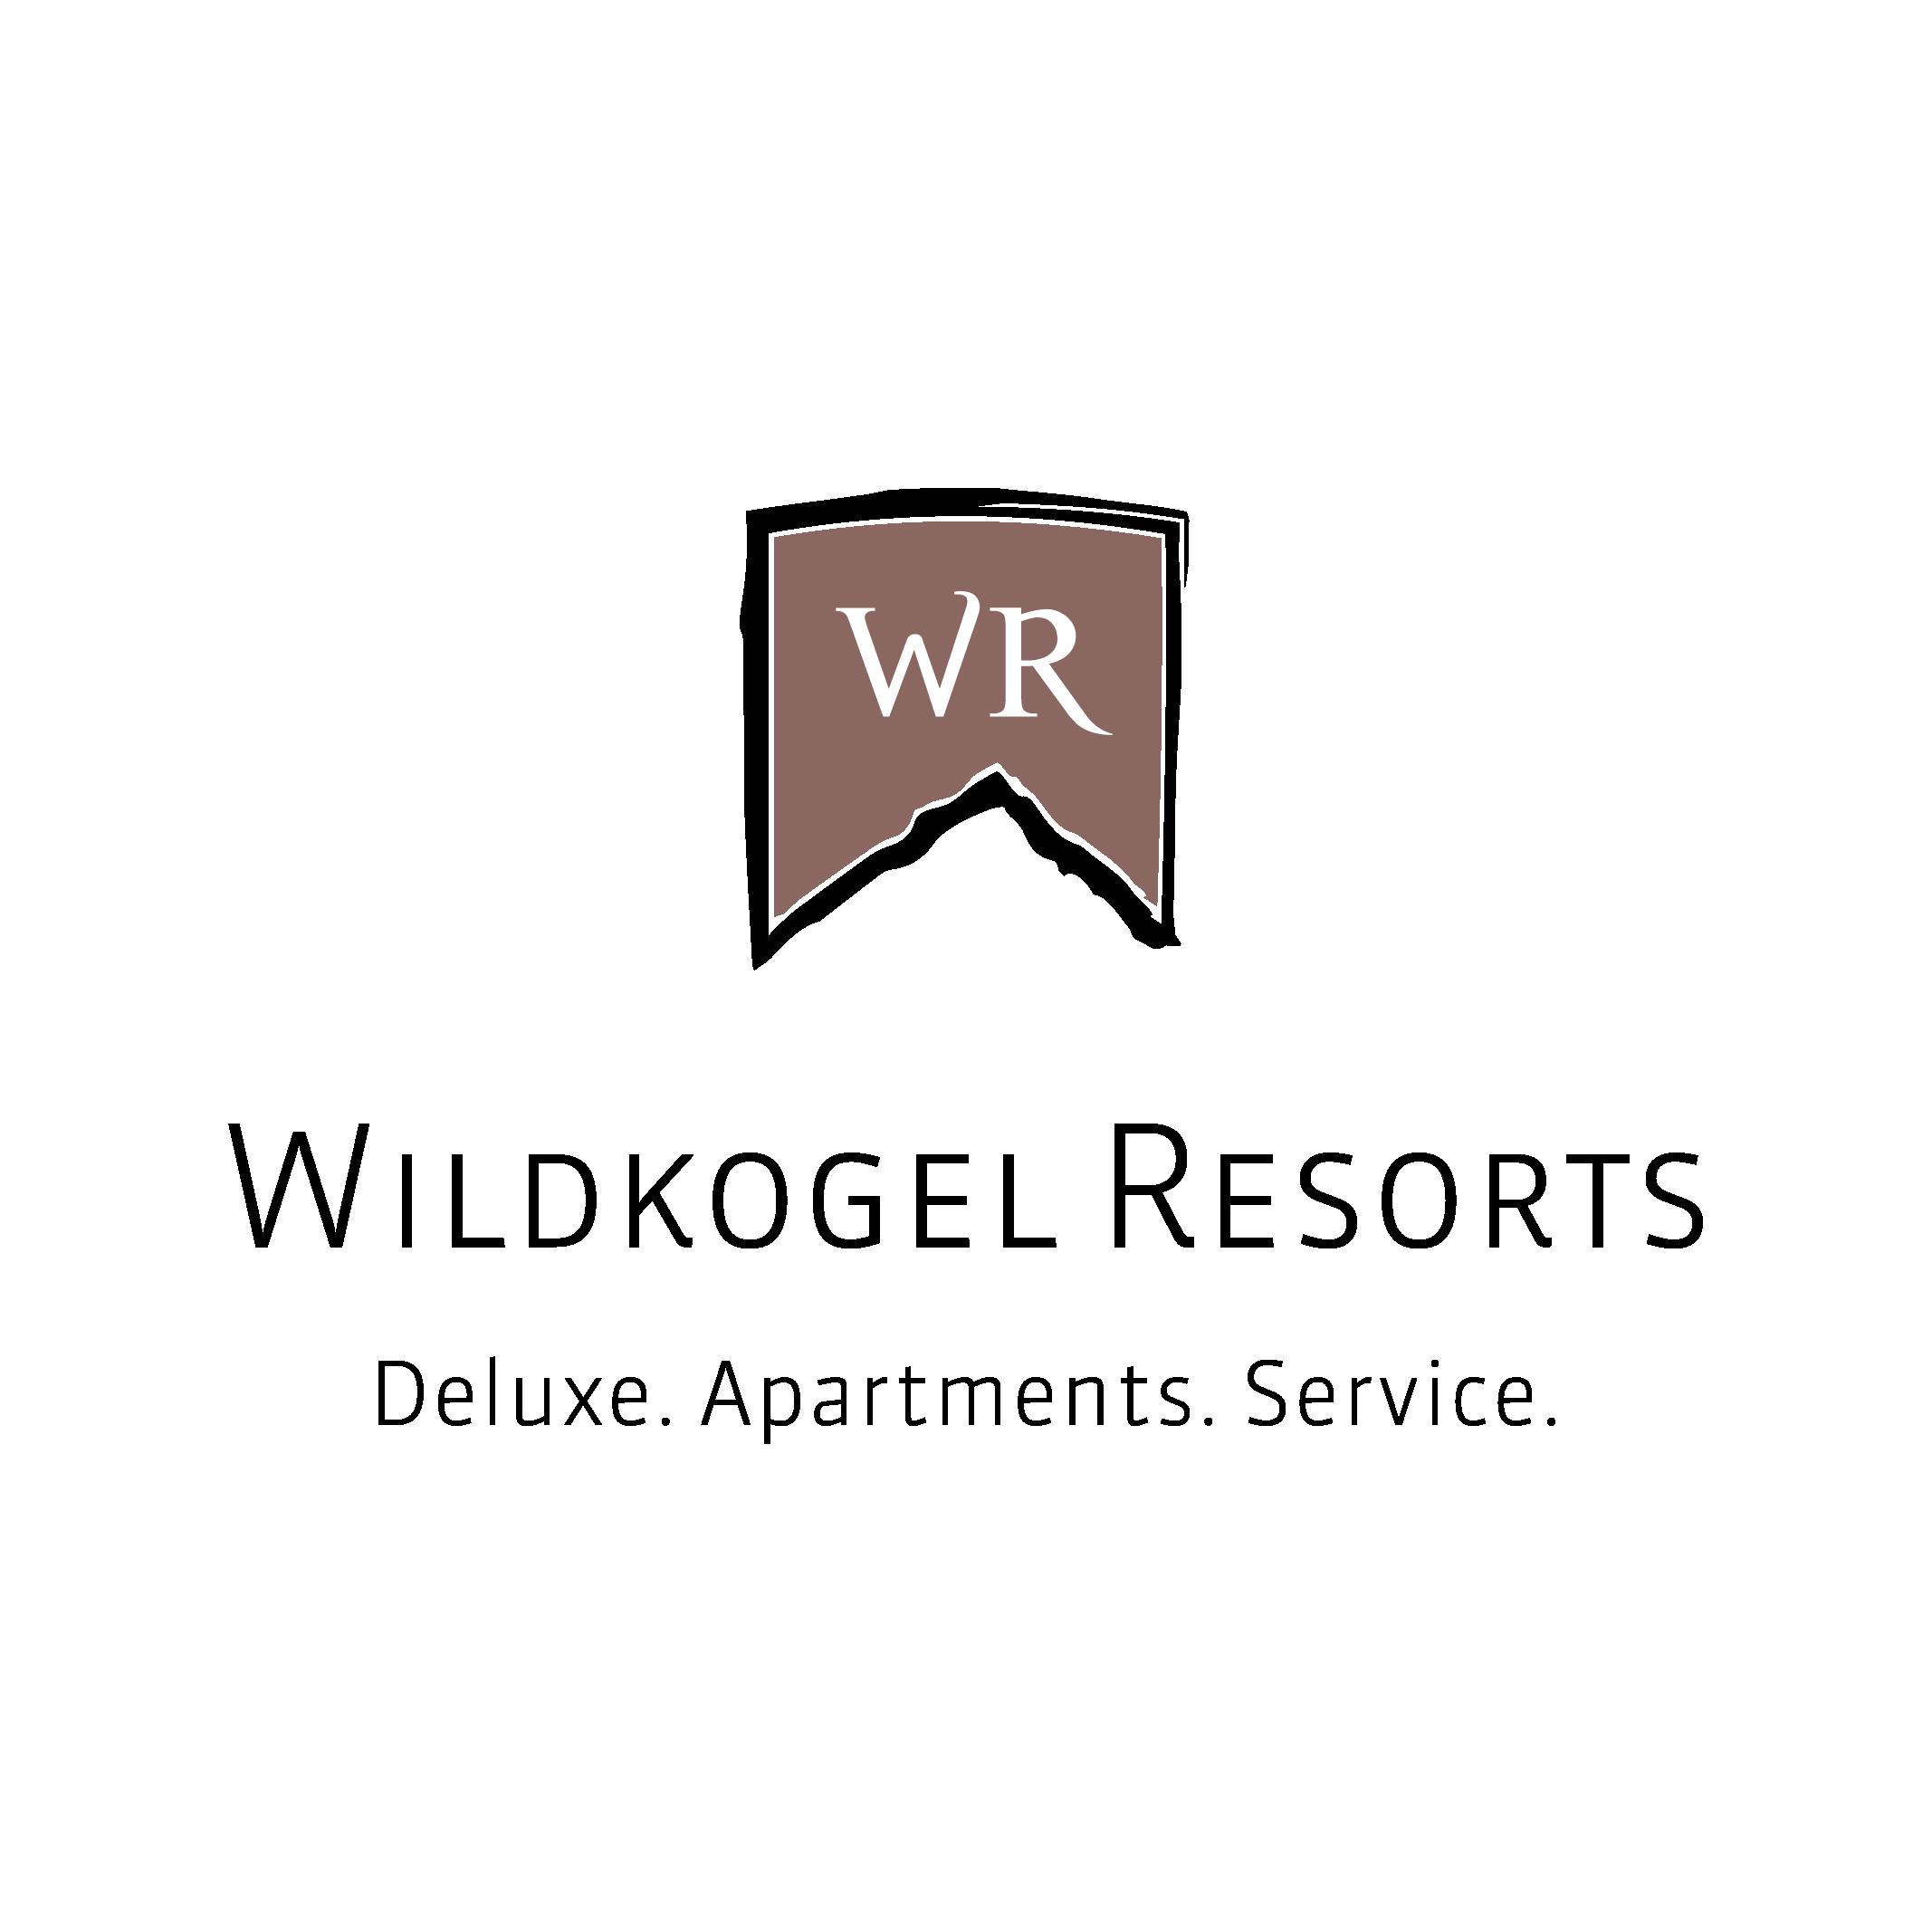 https://www.influxmediahouse.com/wp-content/uploads/2019/01/Logo_WKRS-colour.png